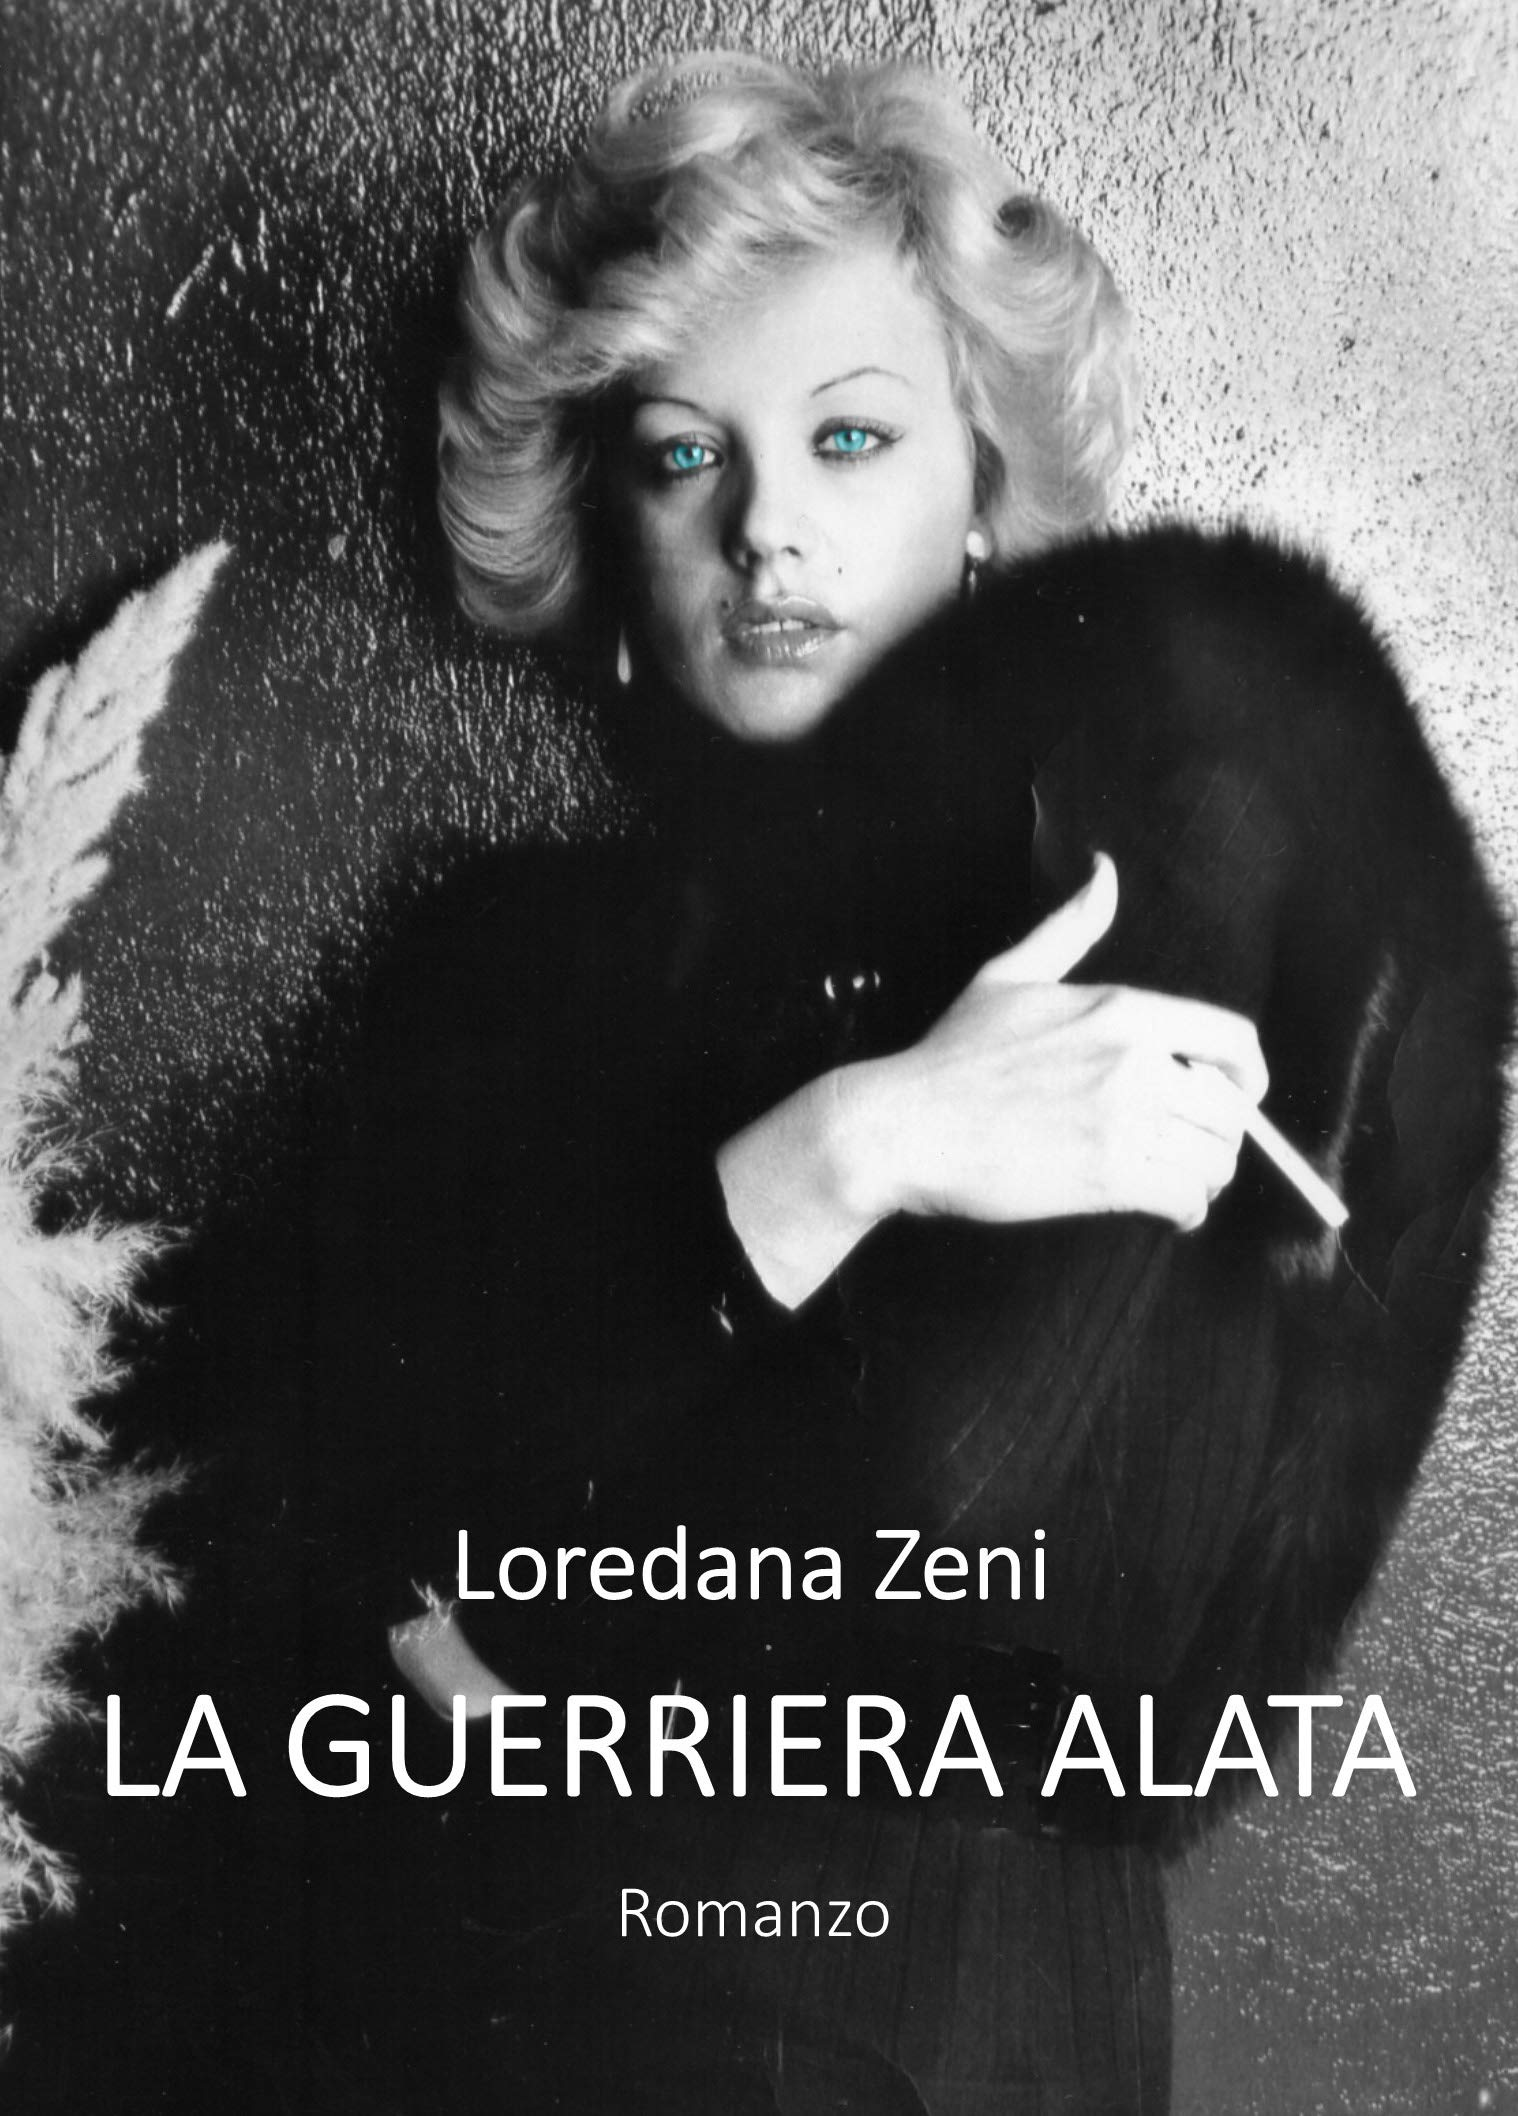 Guerriera itLa Amazon Alata Loredana Libri Zeni hdsQxtrC